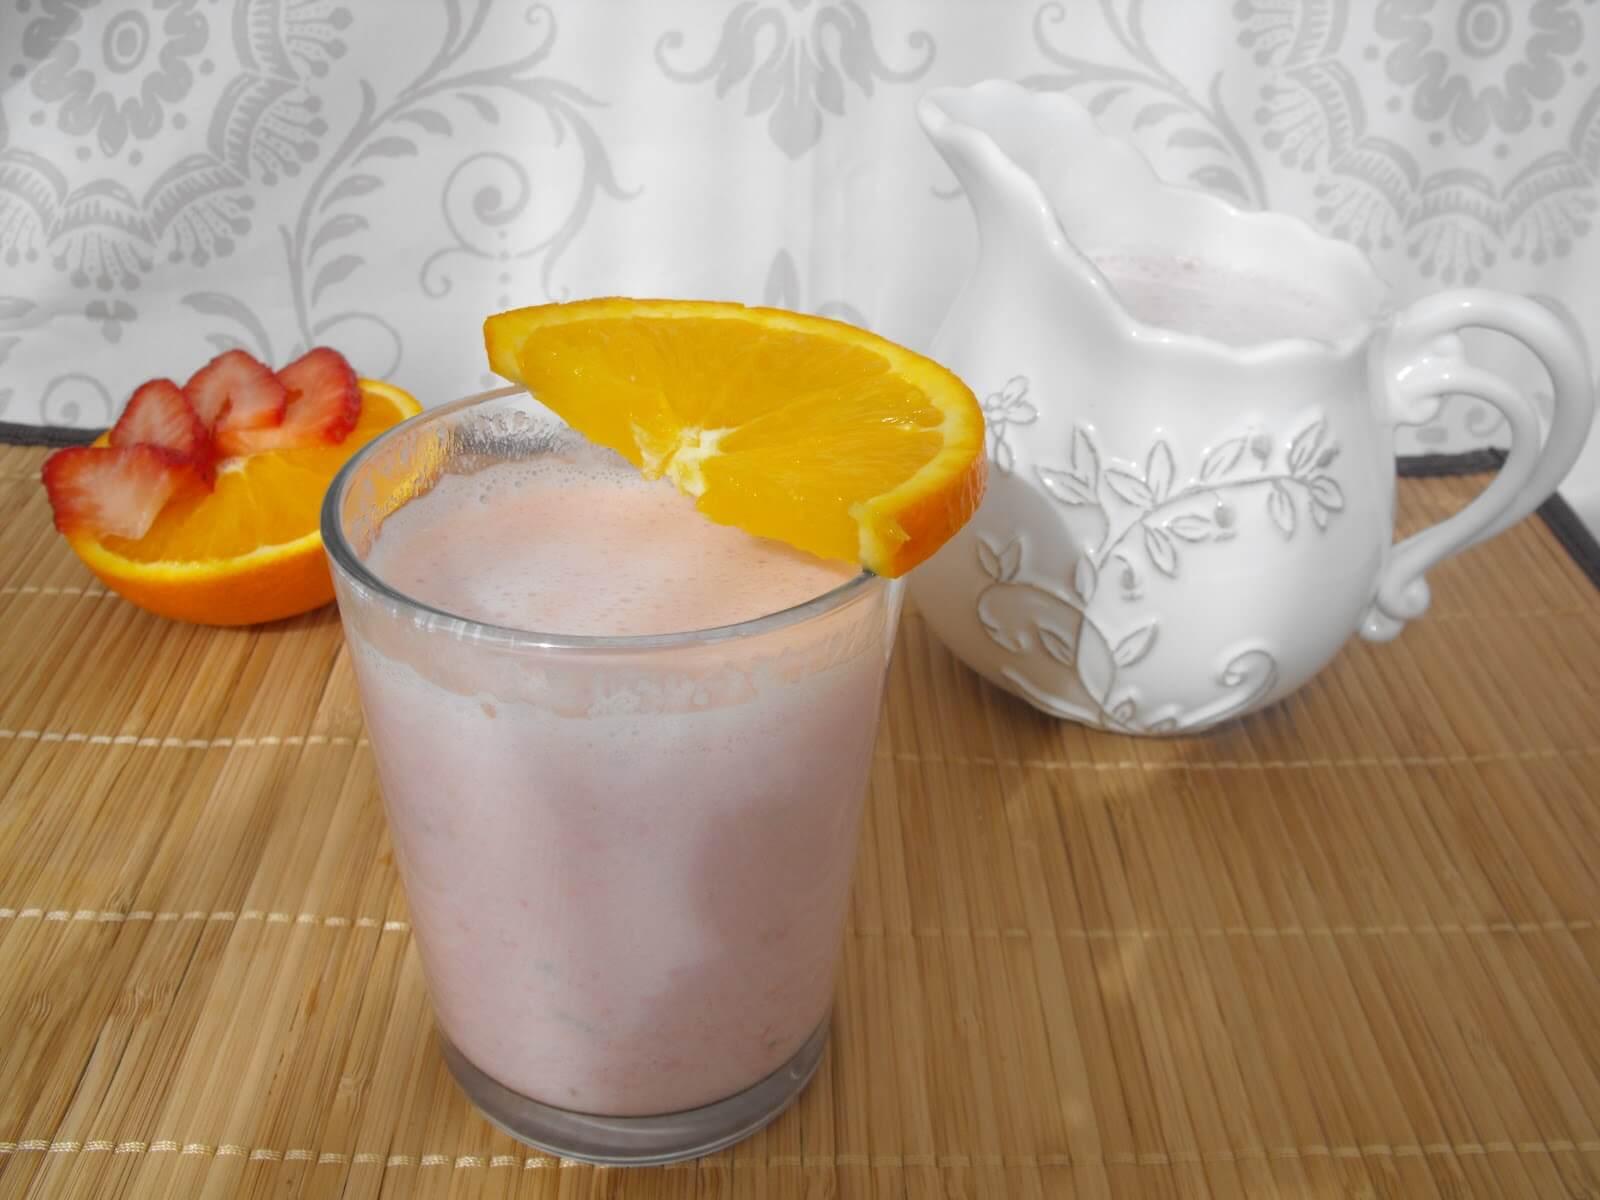 strawberry orange aloe vera smoothie